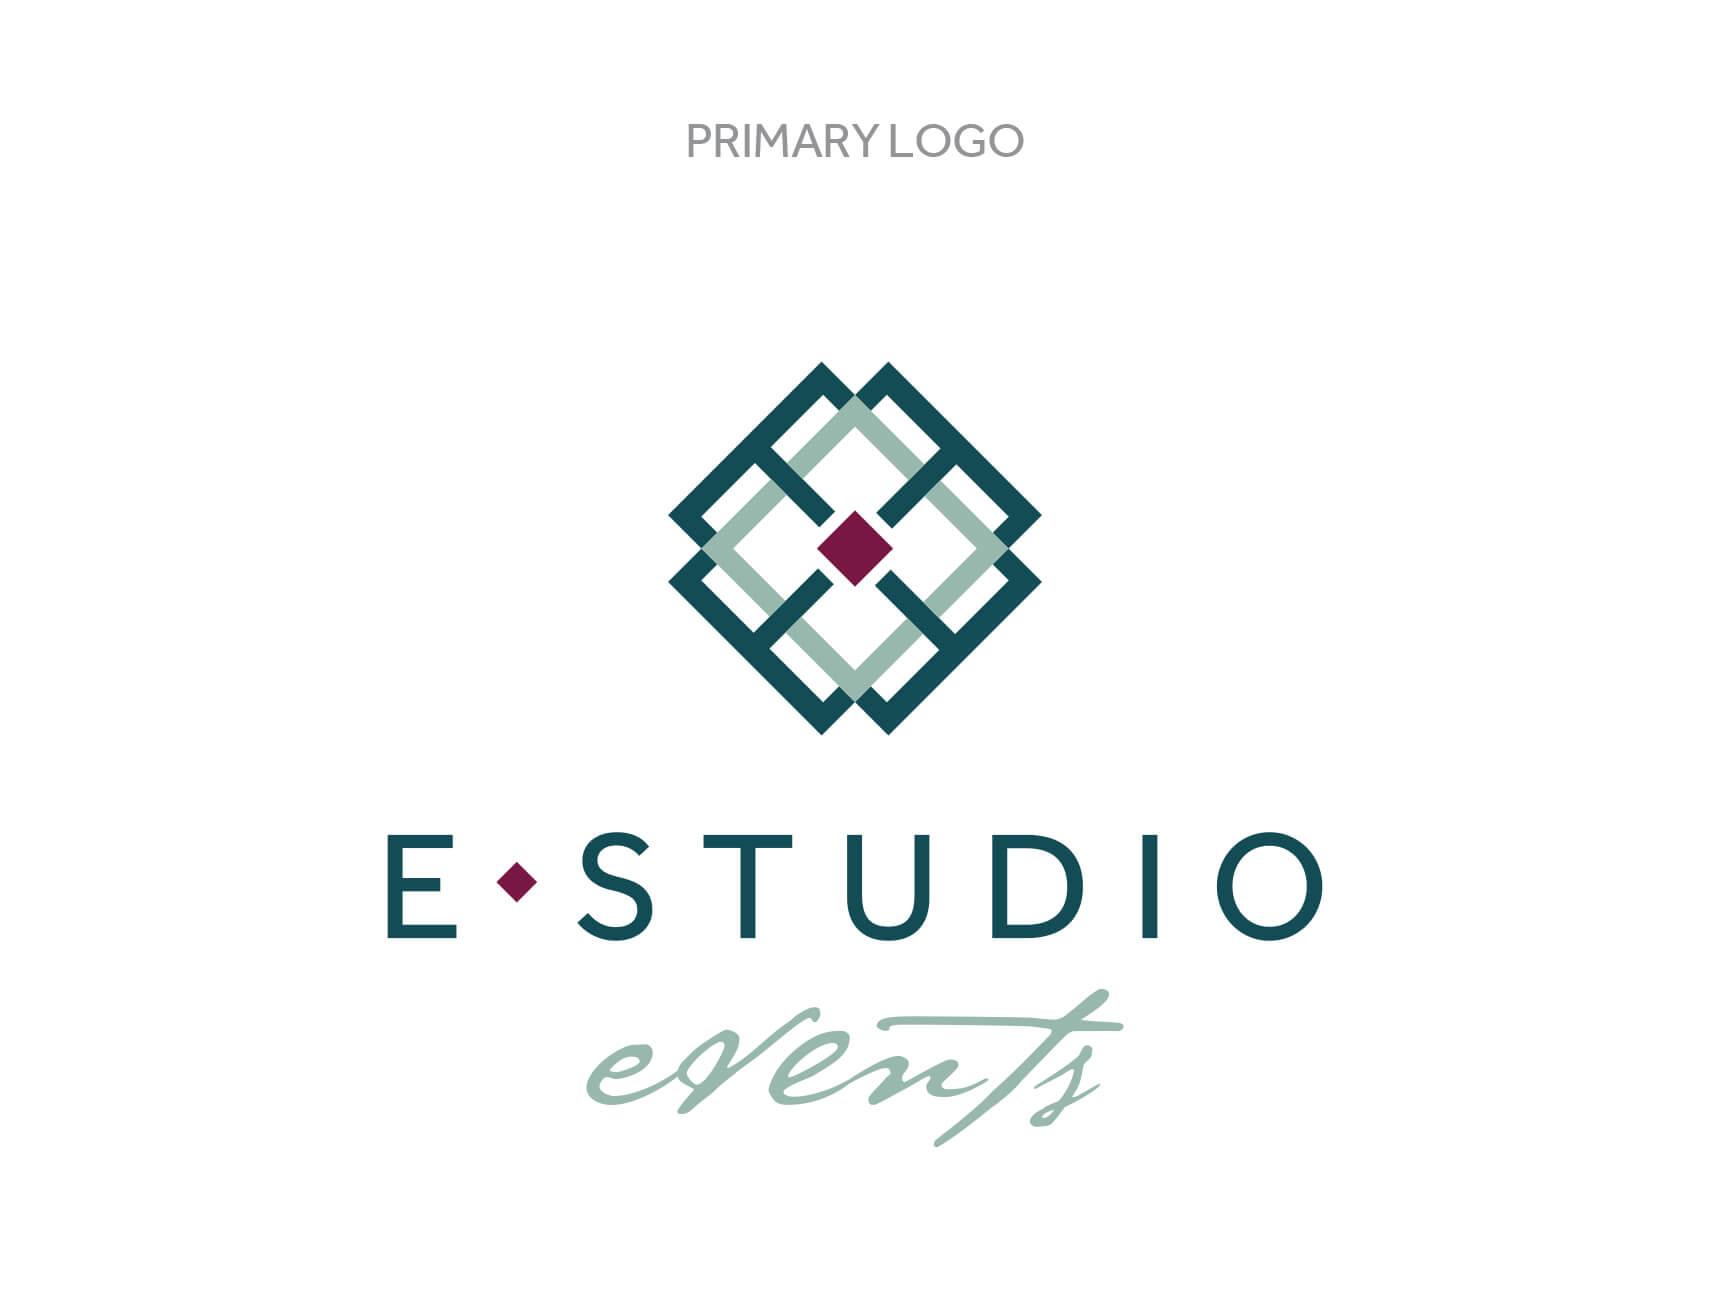 E Studio Events Primary Logo